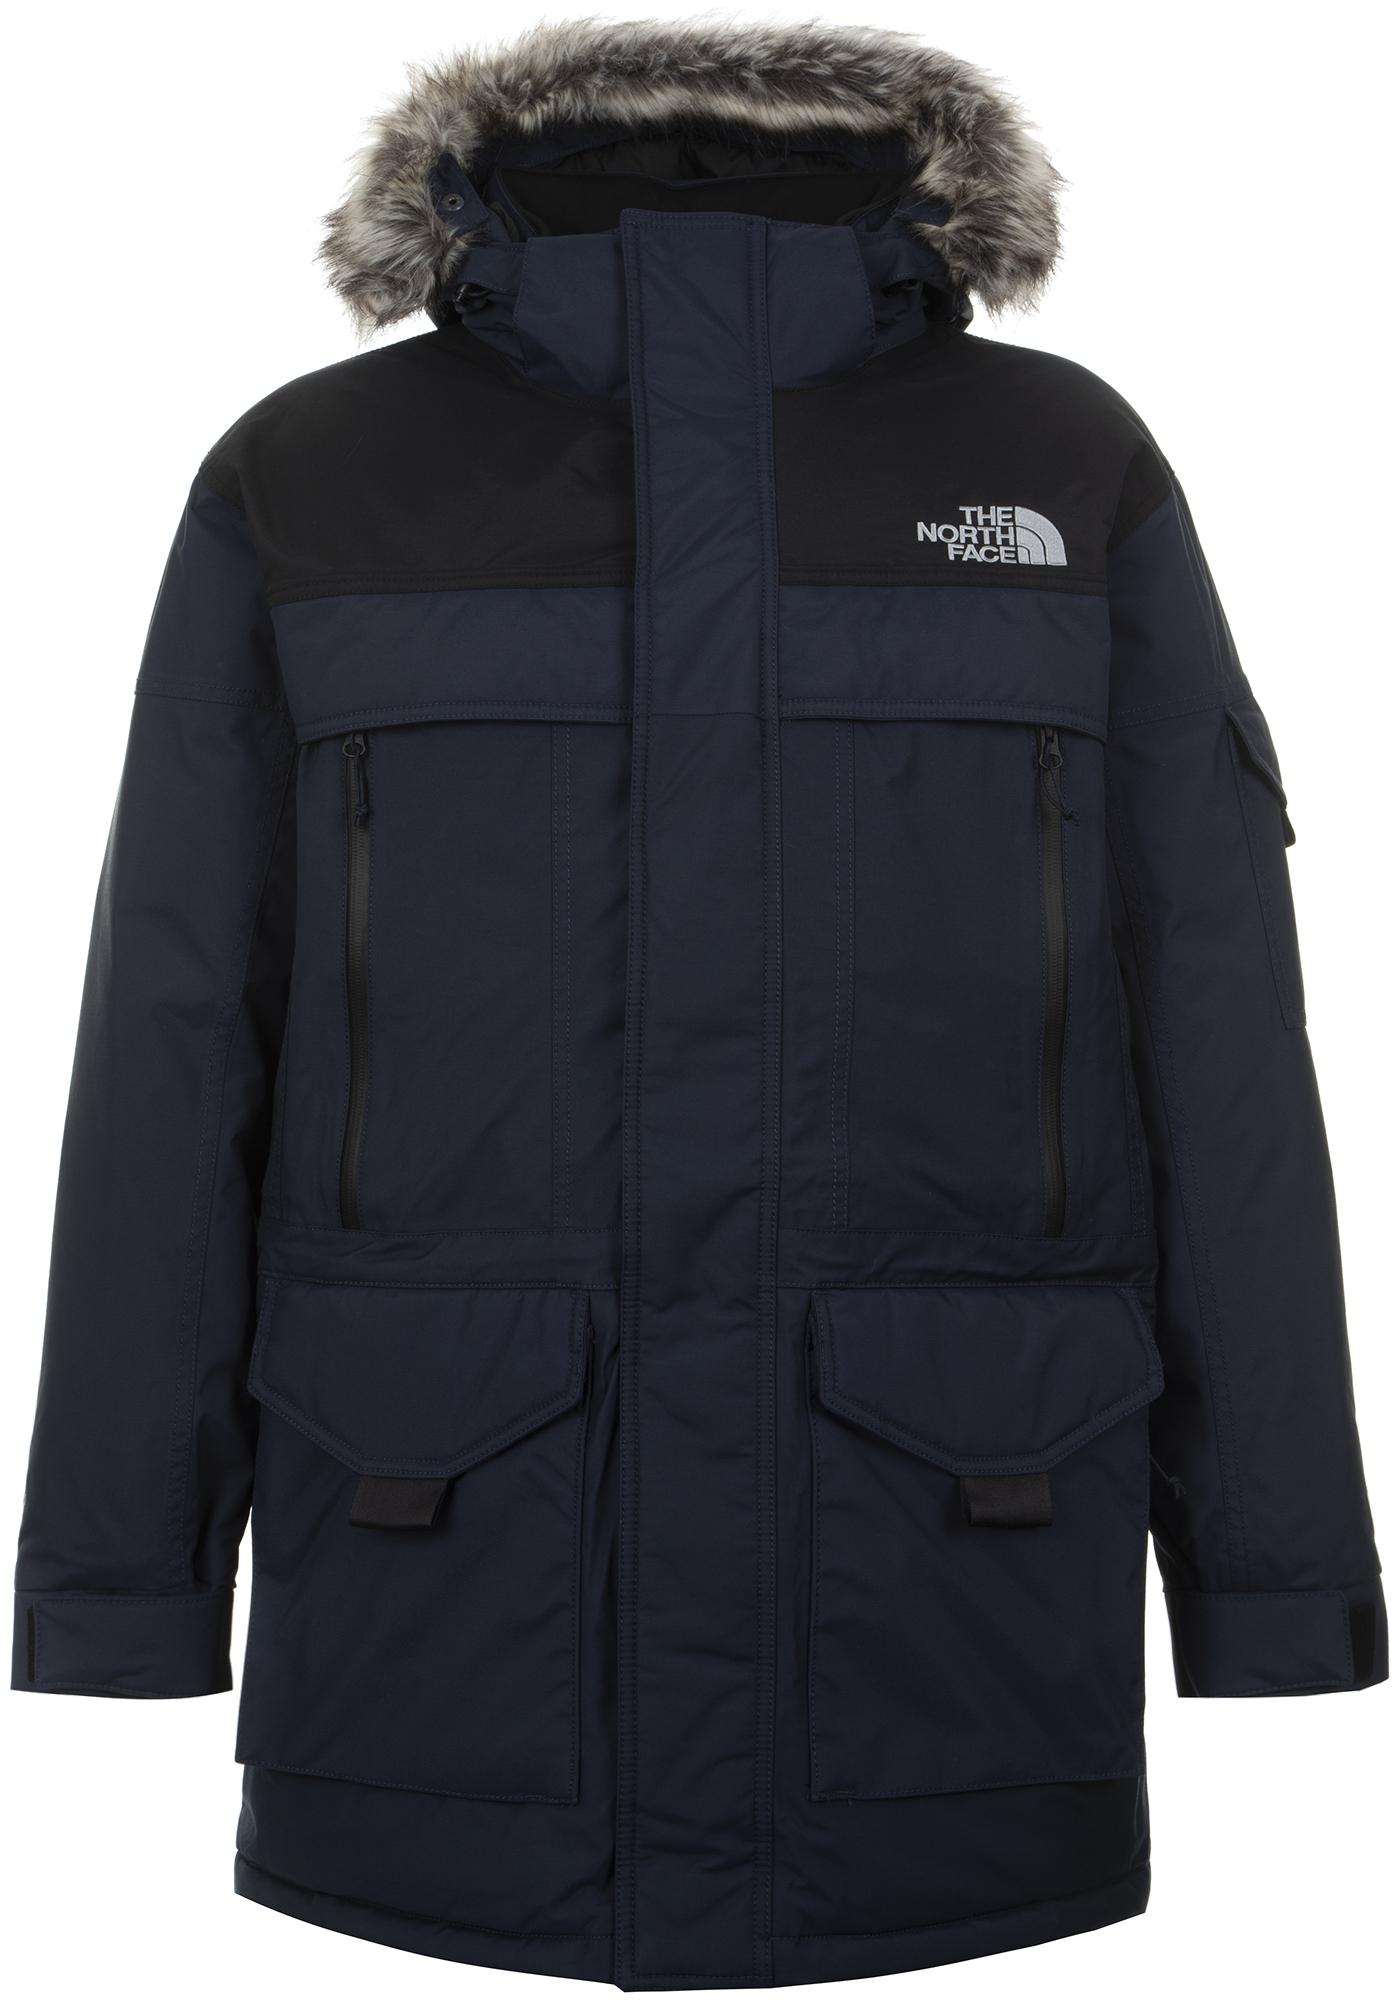 The North Face Куртка пуховая мужская The North Face Mc Murdo 2, размер 52 цена